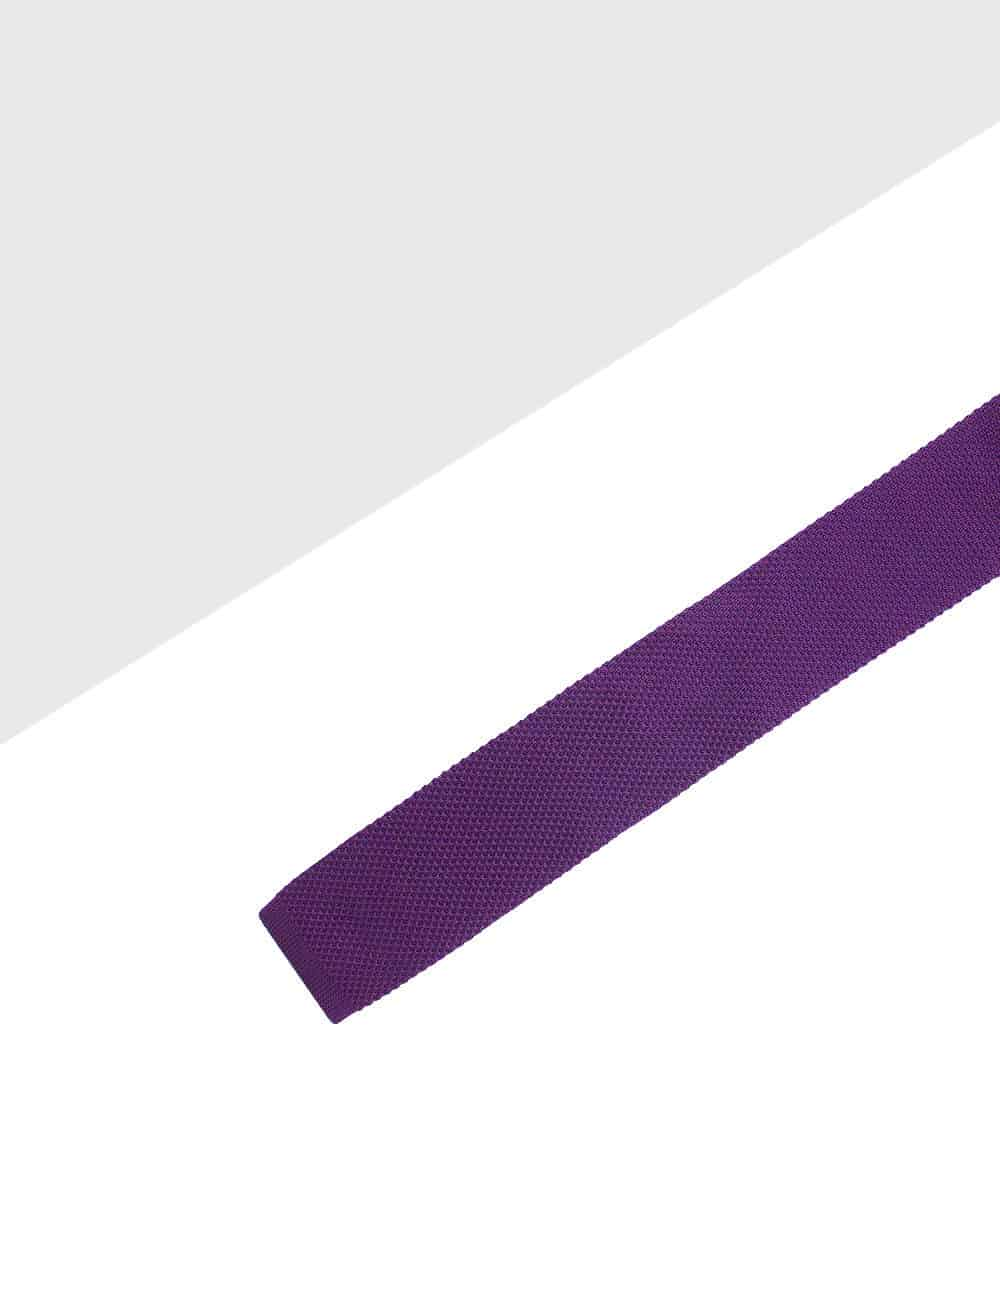 Solid Bright Purple Knitted Necktie KNT71.8